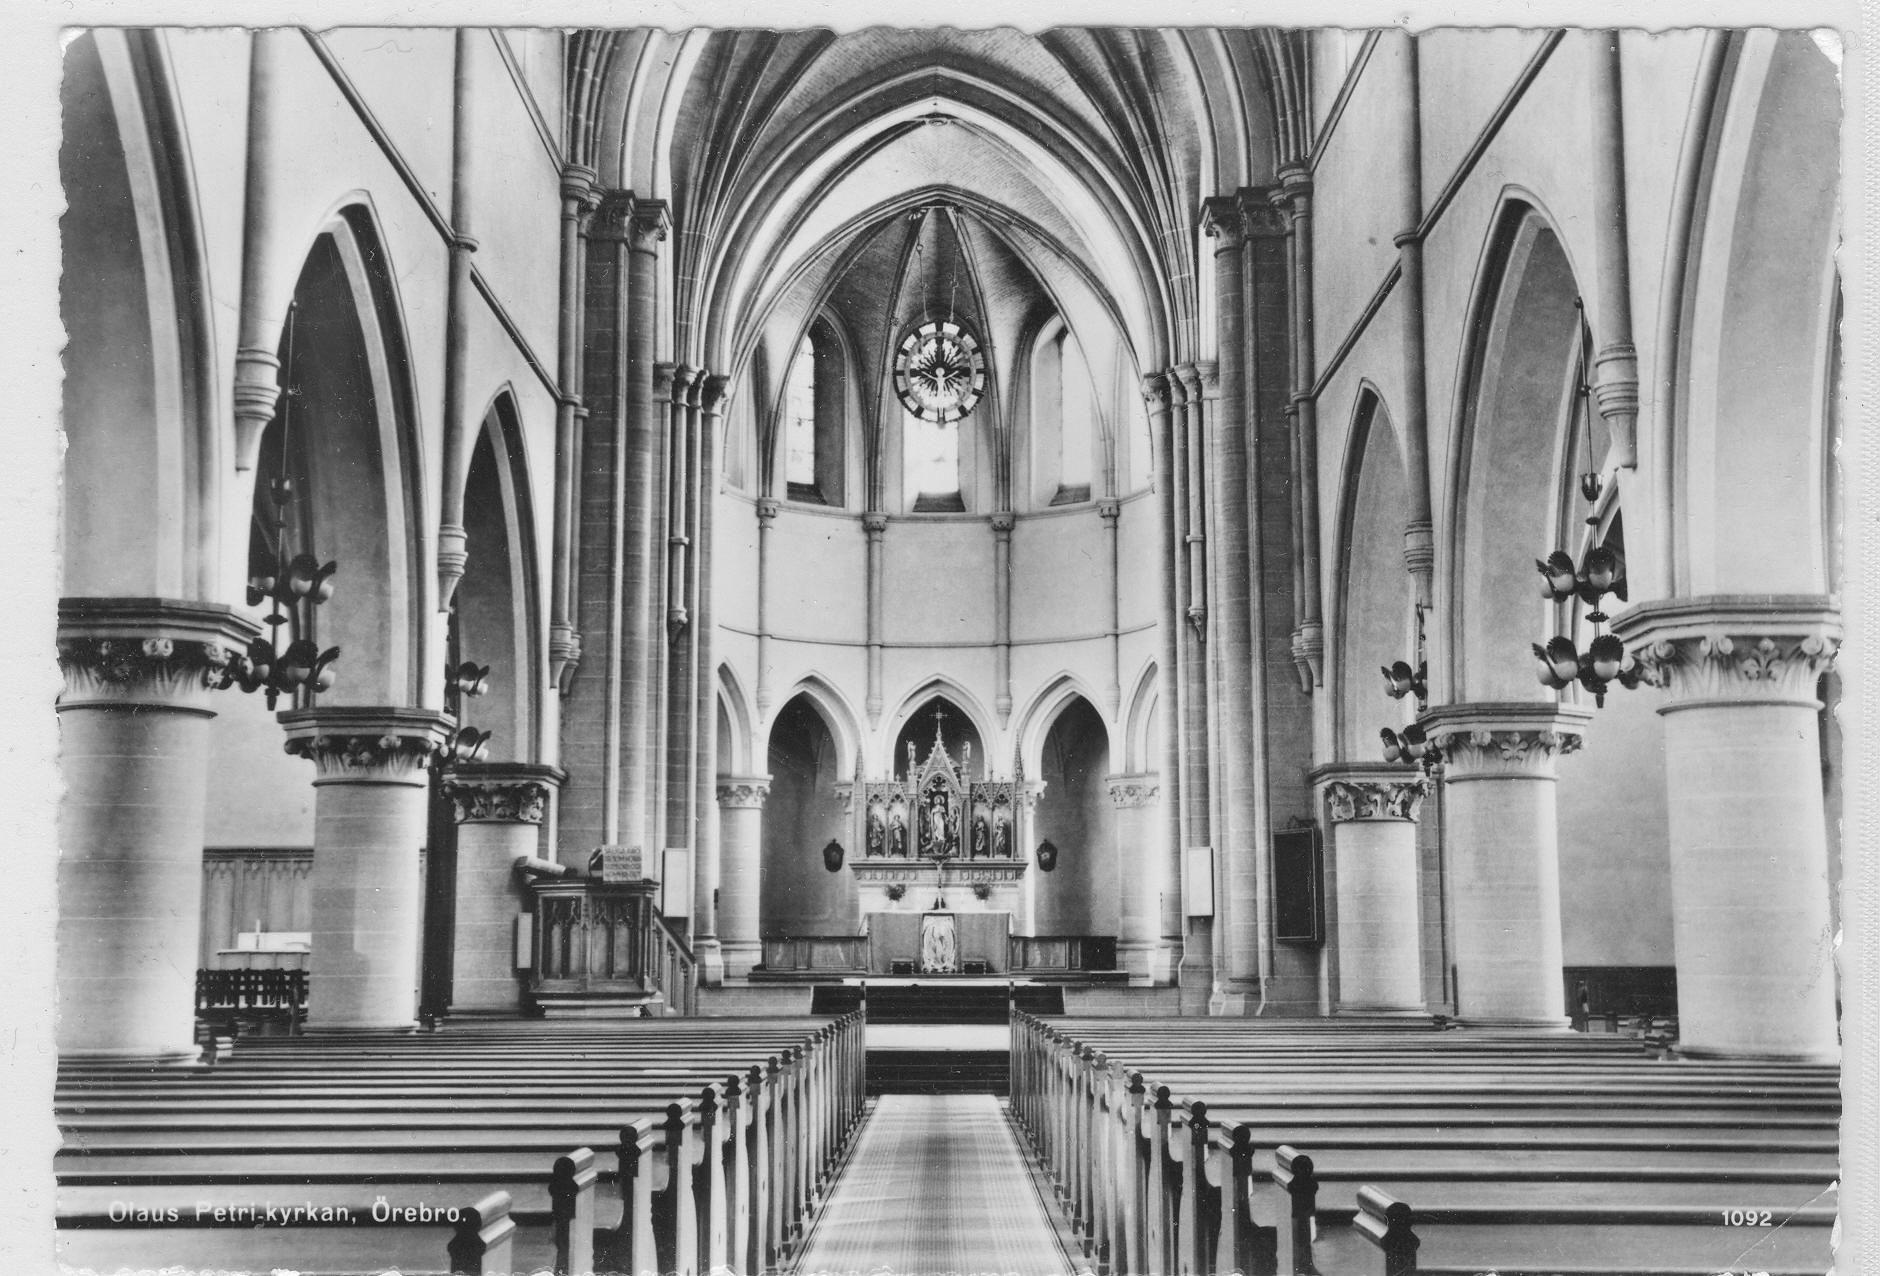 Olaus Petri frsamling, Svenska kyrkan i rebro - Post